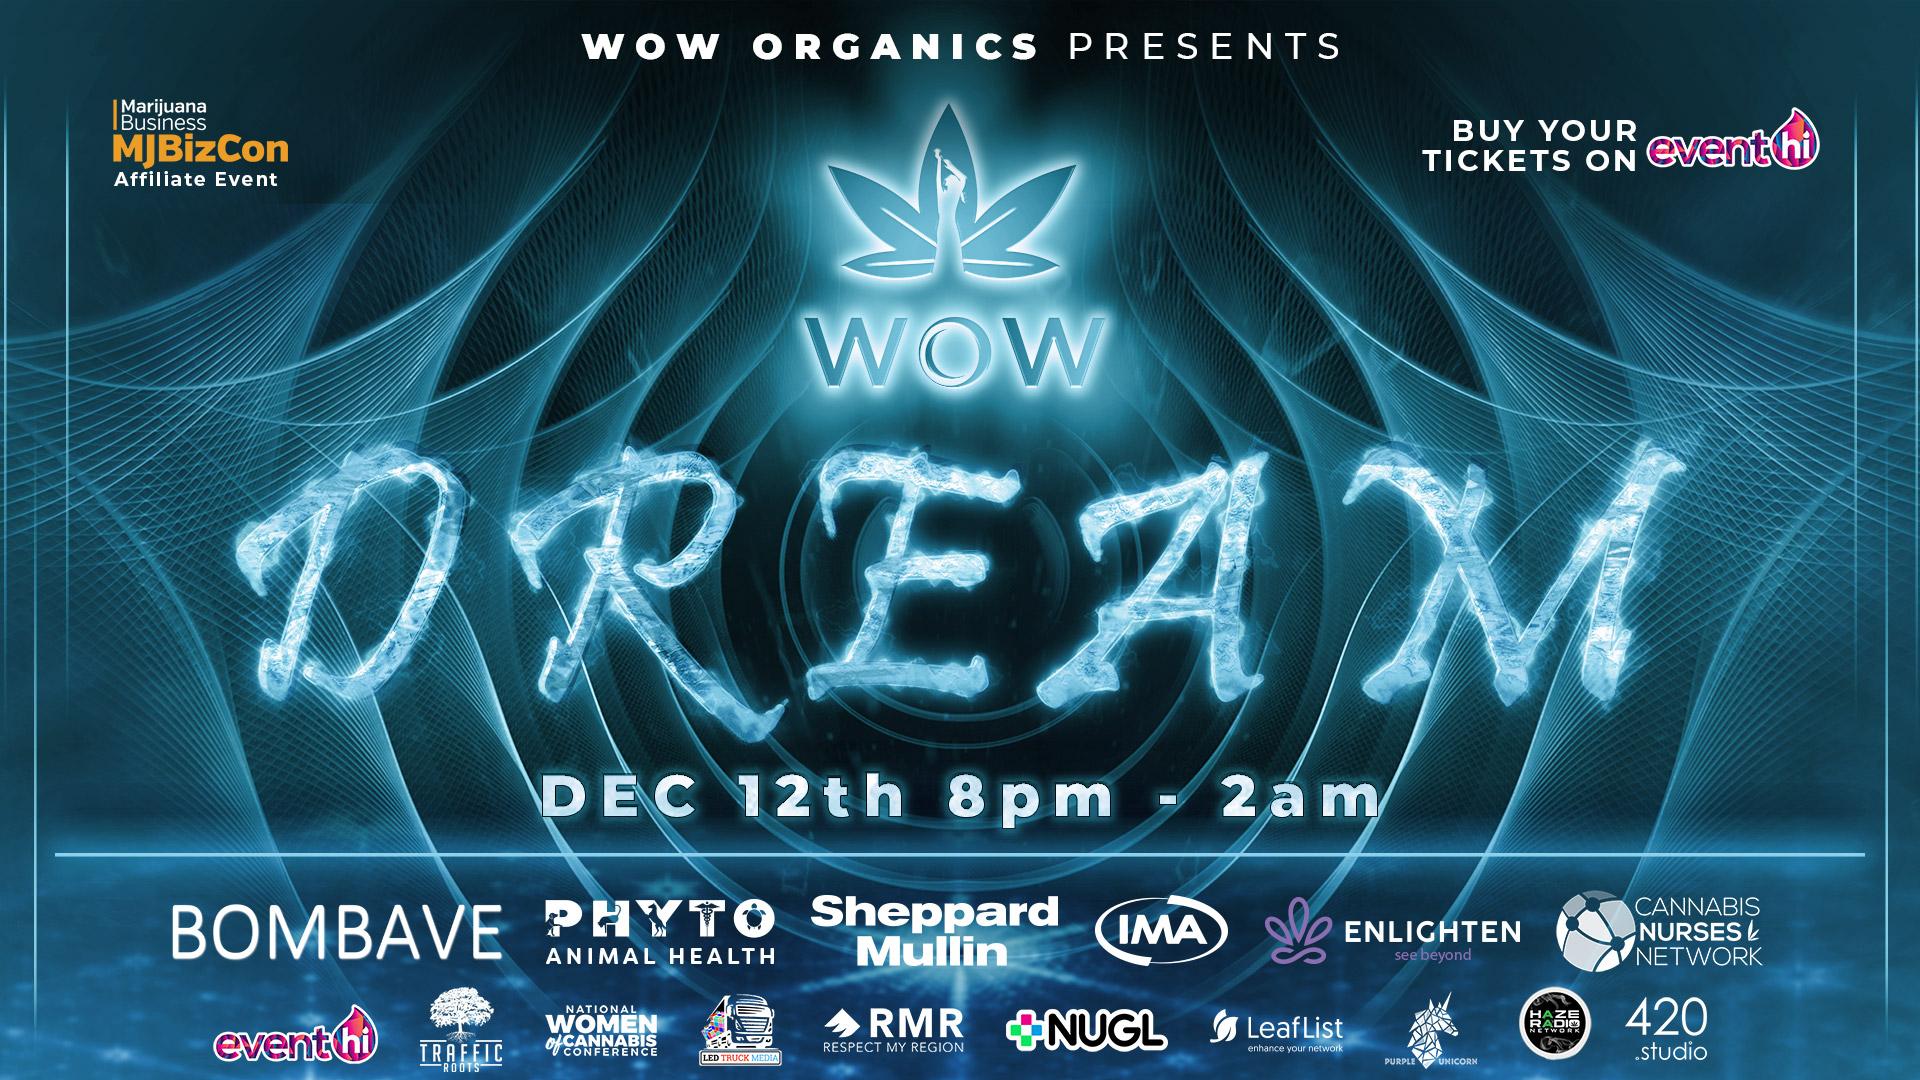 DREAM - WOW Organics Launch Party  (MJBIZCON)